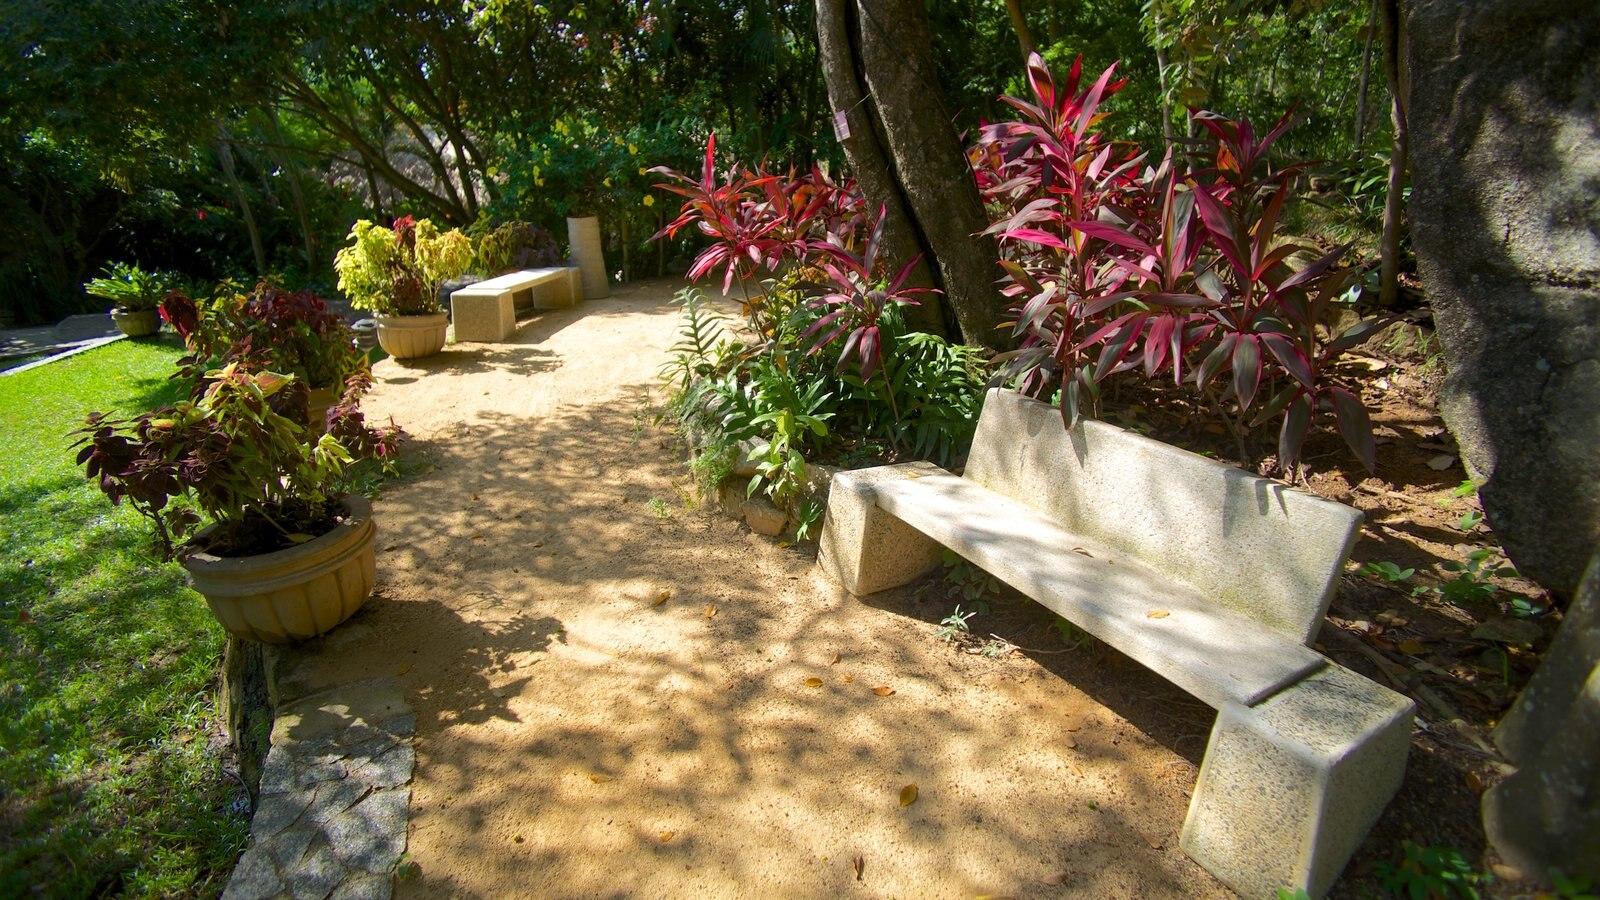 Jardin Botanico De Acapulco Showing A Park